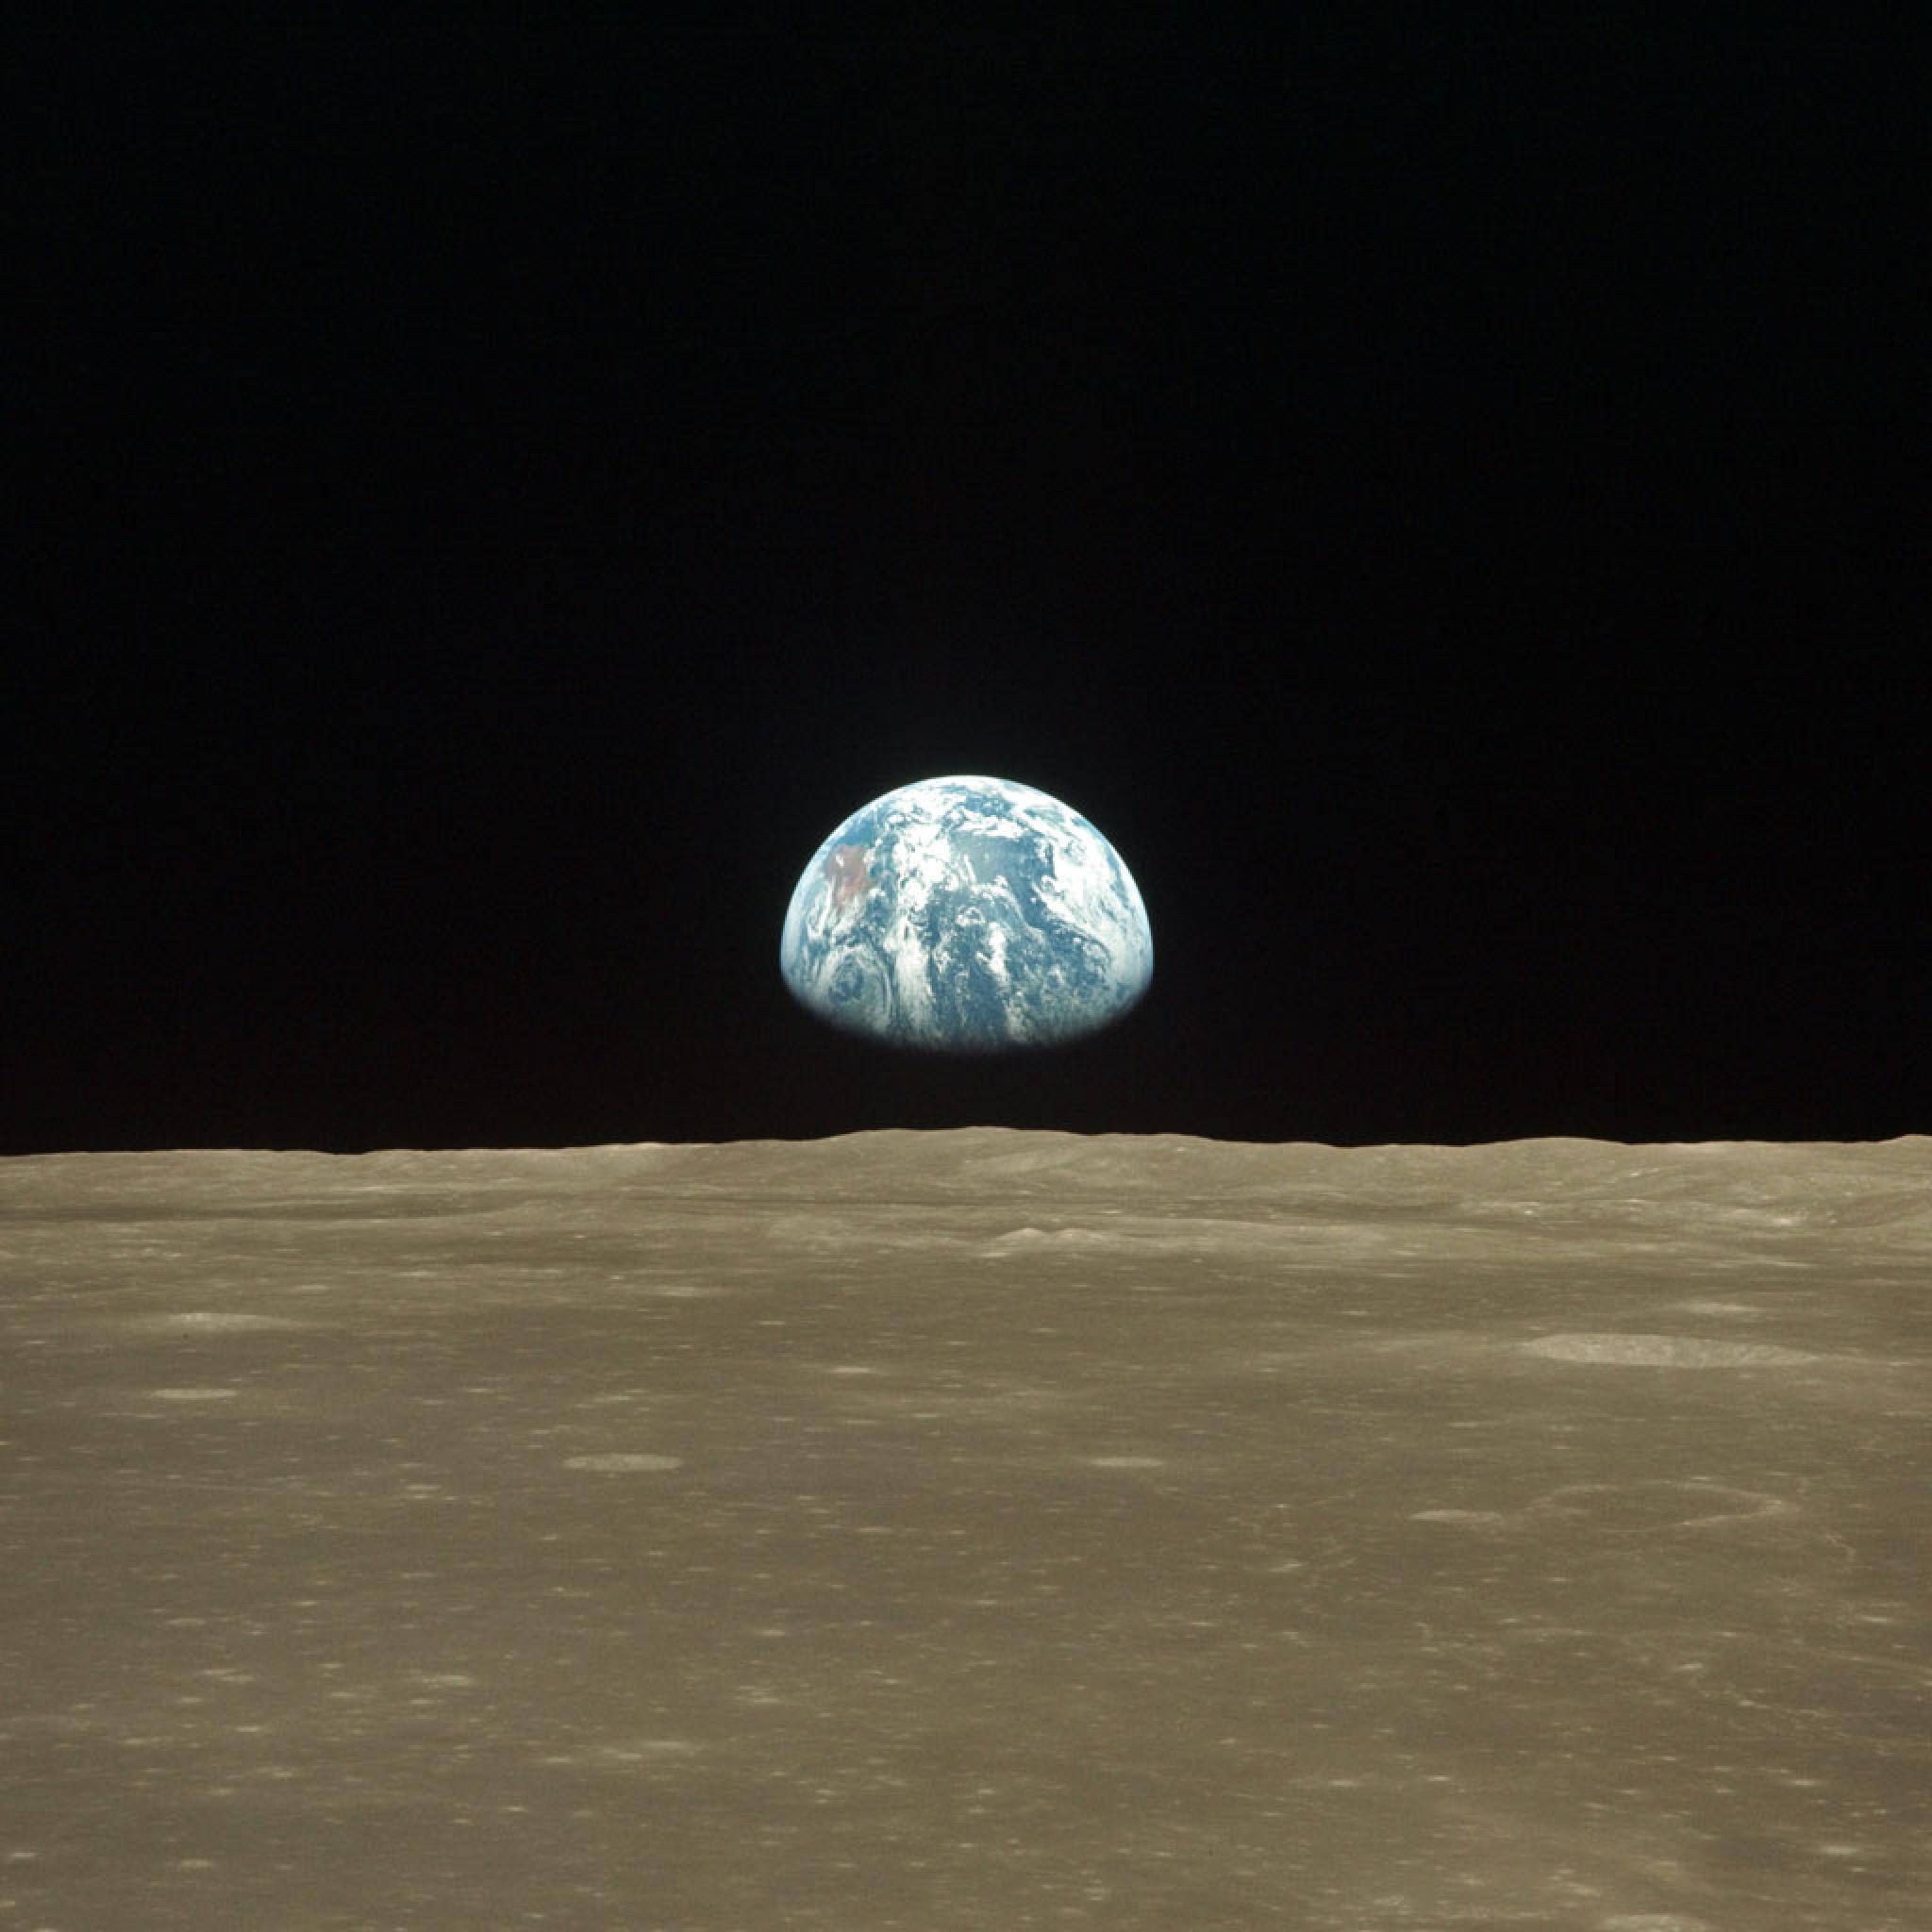 Andromeda Galaxy Wallpaper Iphone Space Earth Rising Over Moon Horizon Ipad Iphone Hd